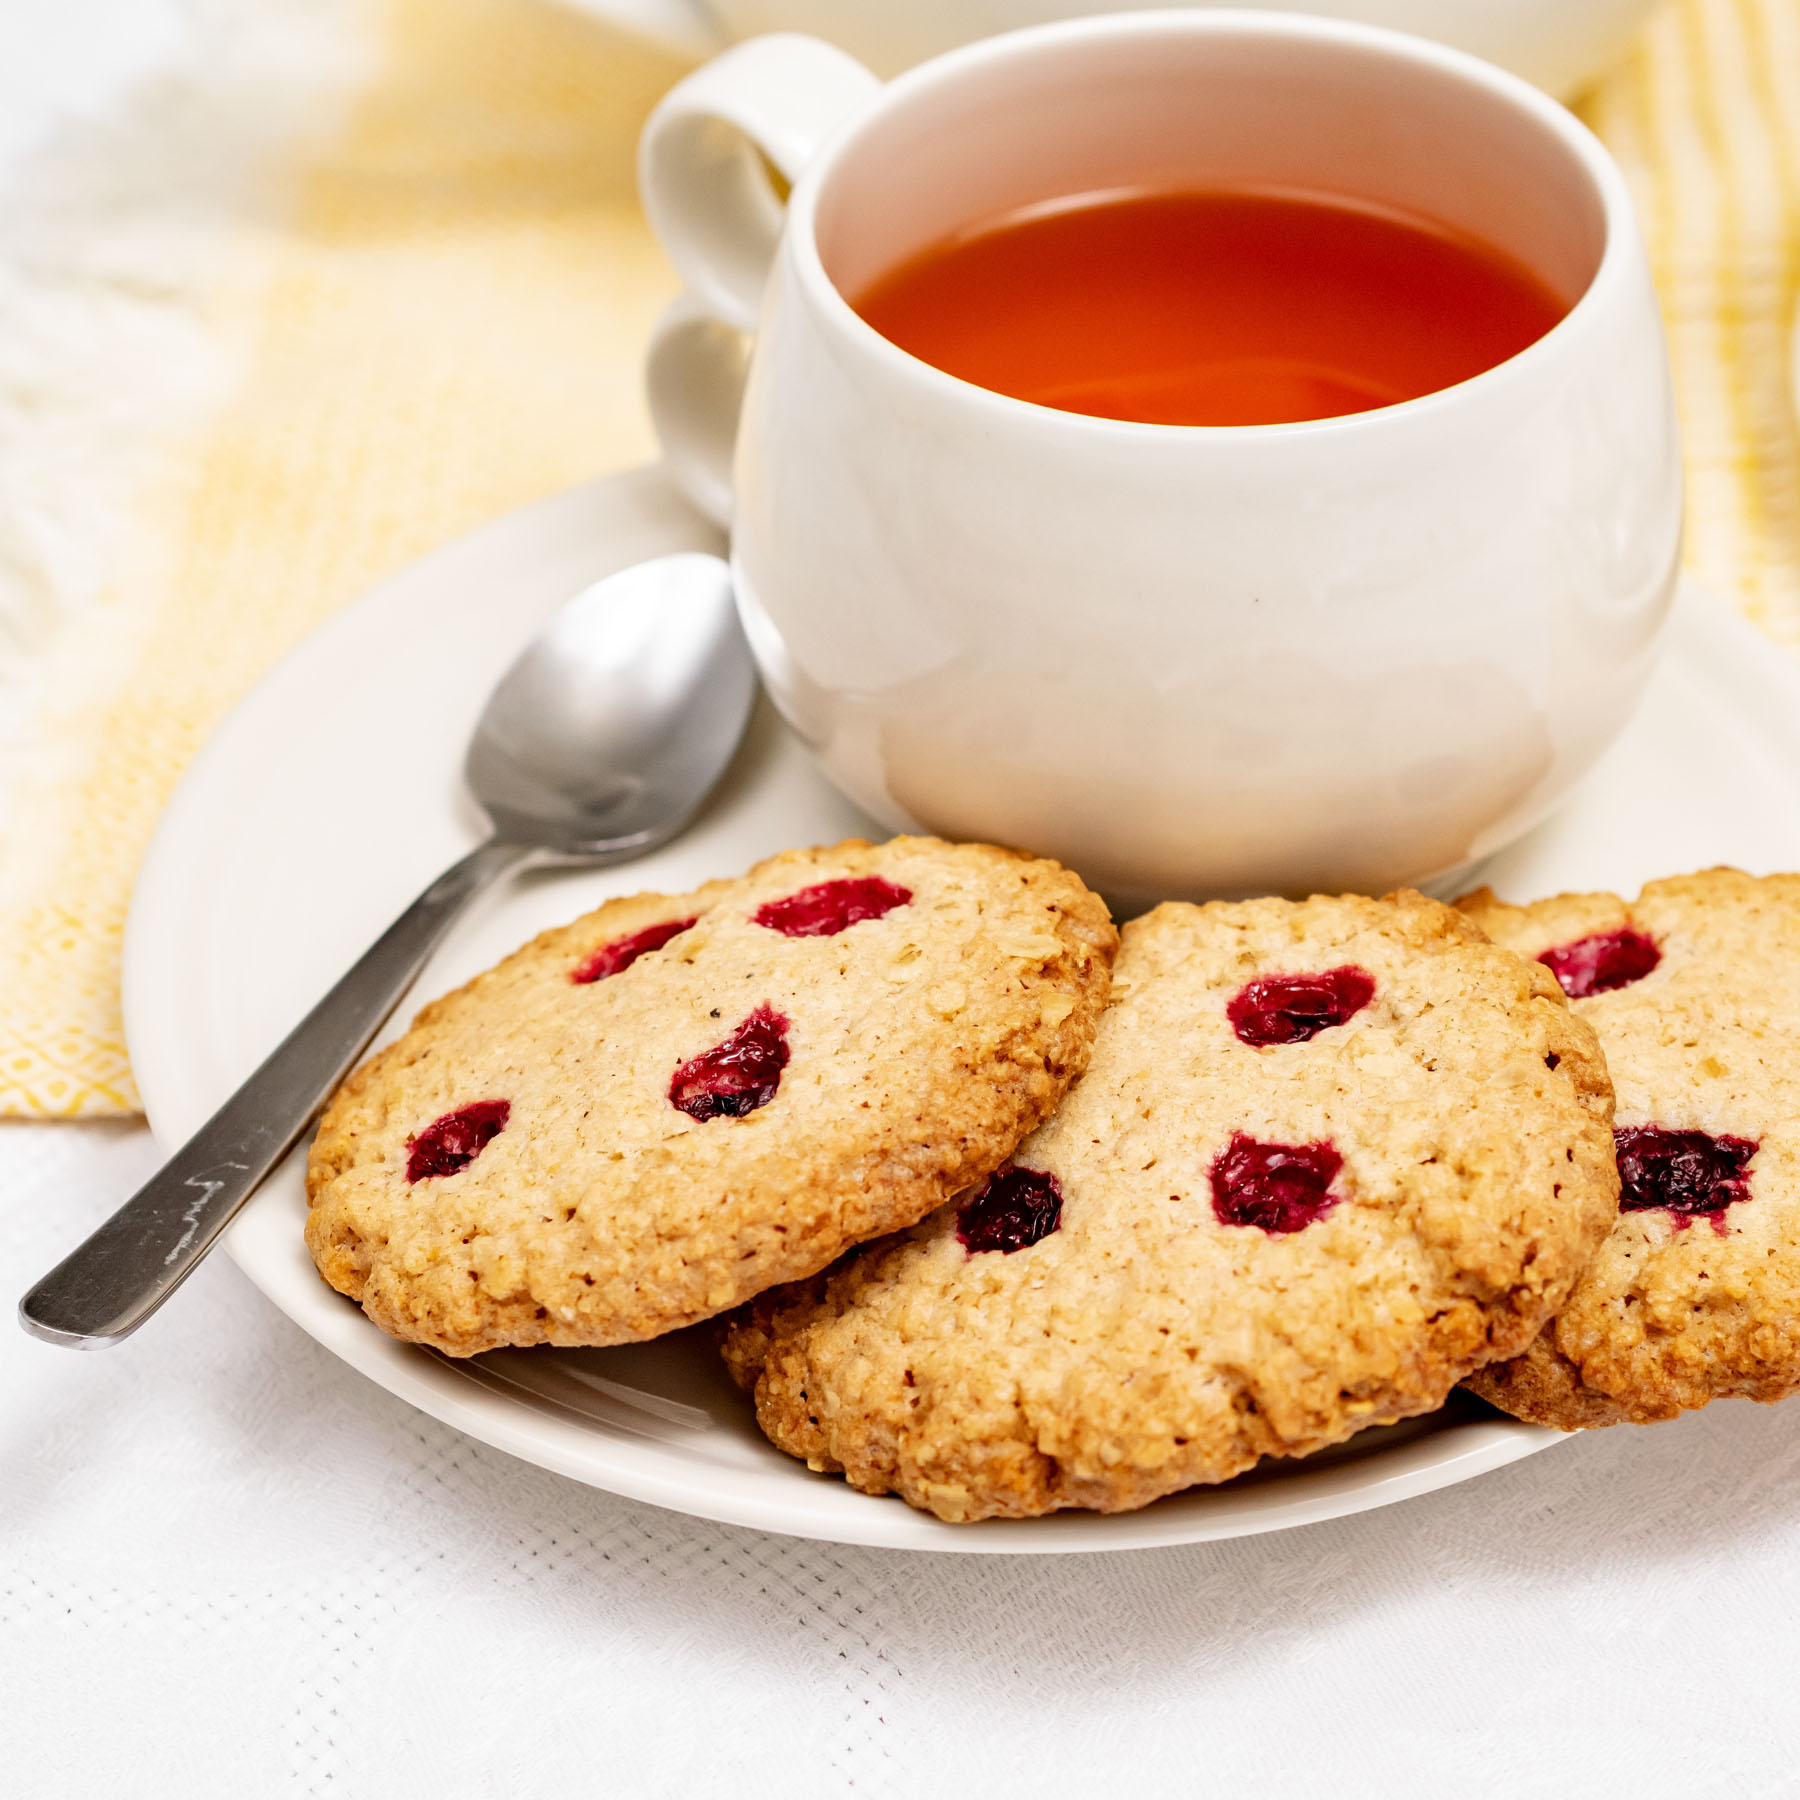 Gluten-free oat & lingonberry cookies